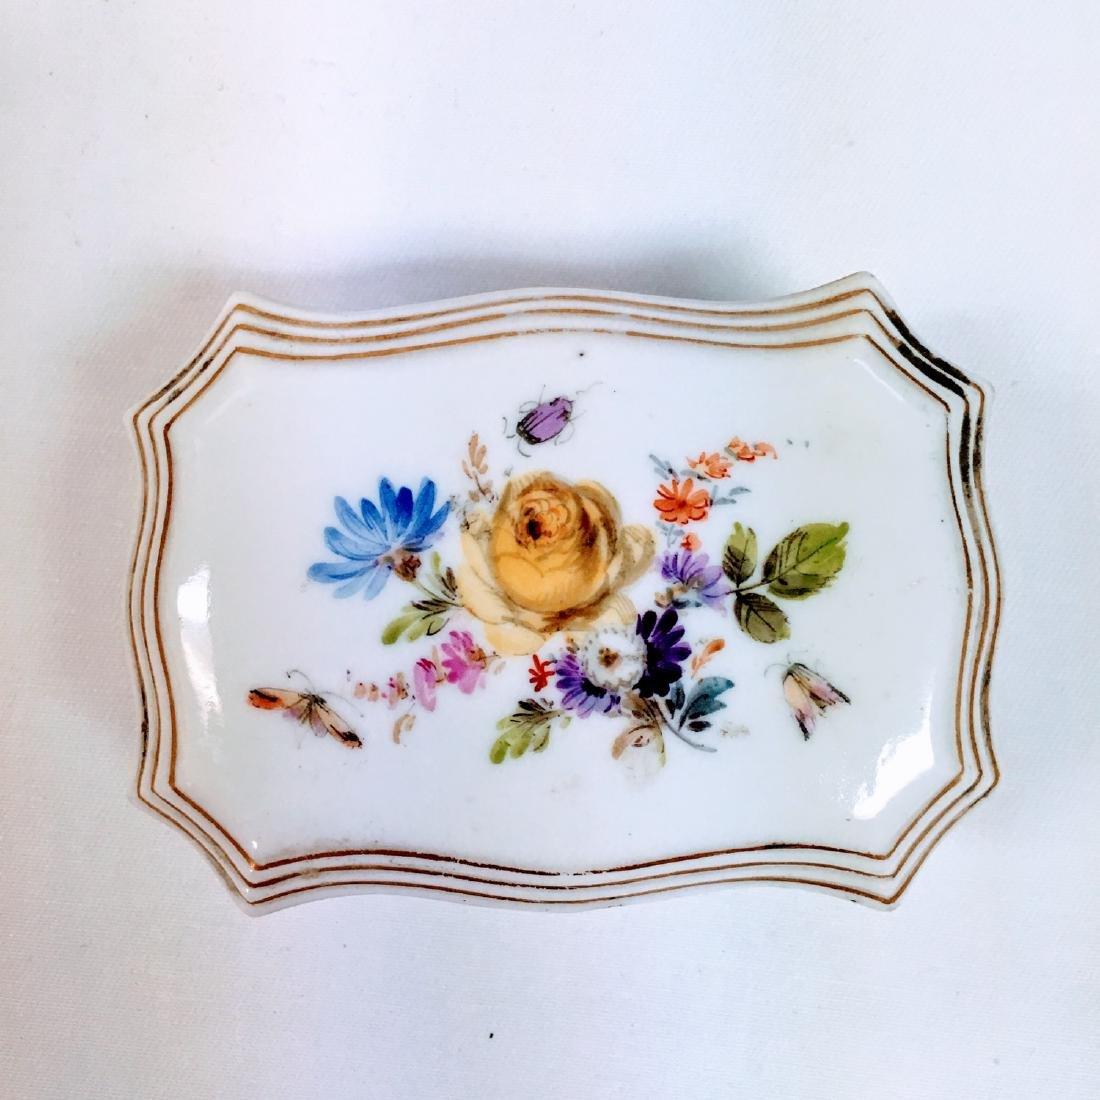 Vintage porcelain meissen hand painted trinket box - 8